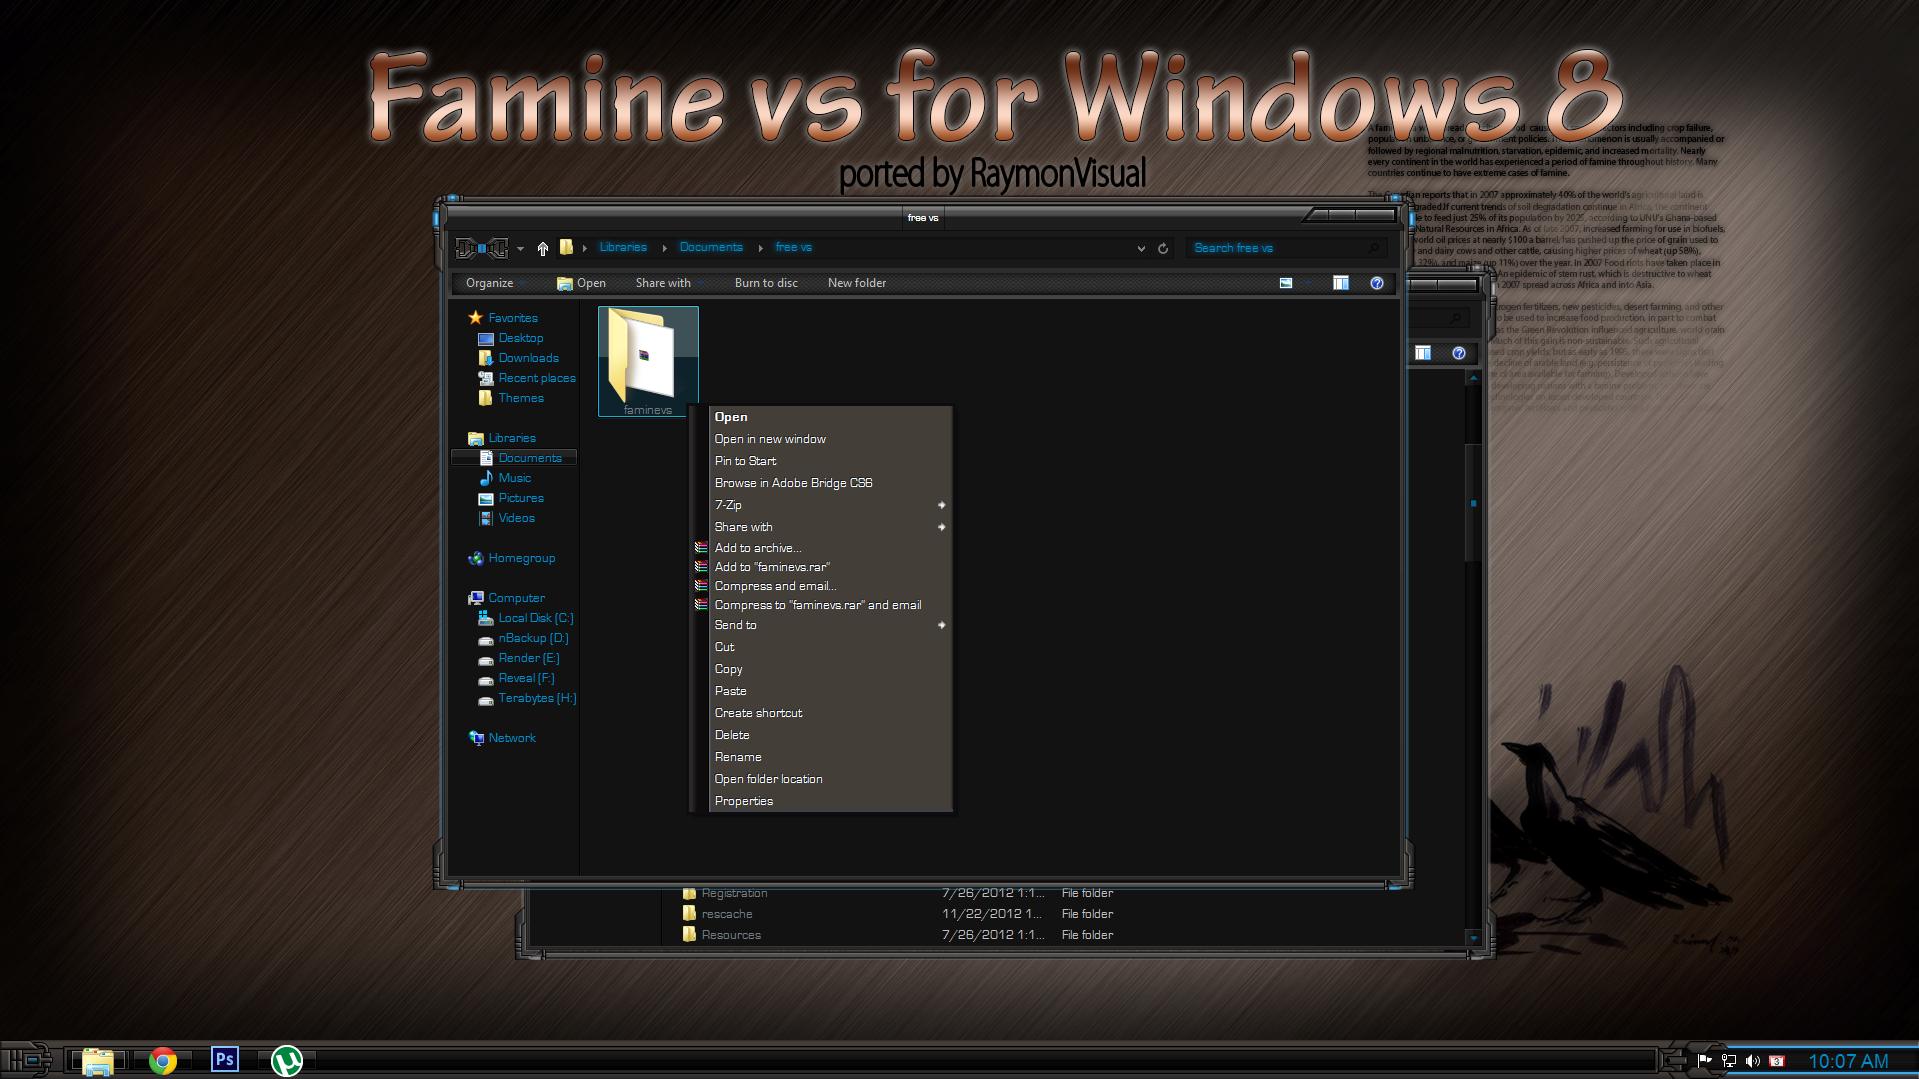 FAMINE vs port (free) for Windows8 by RaymonVisual